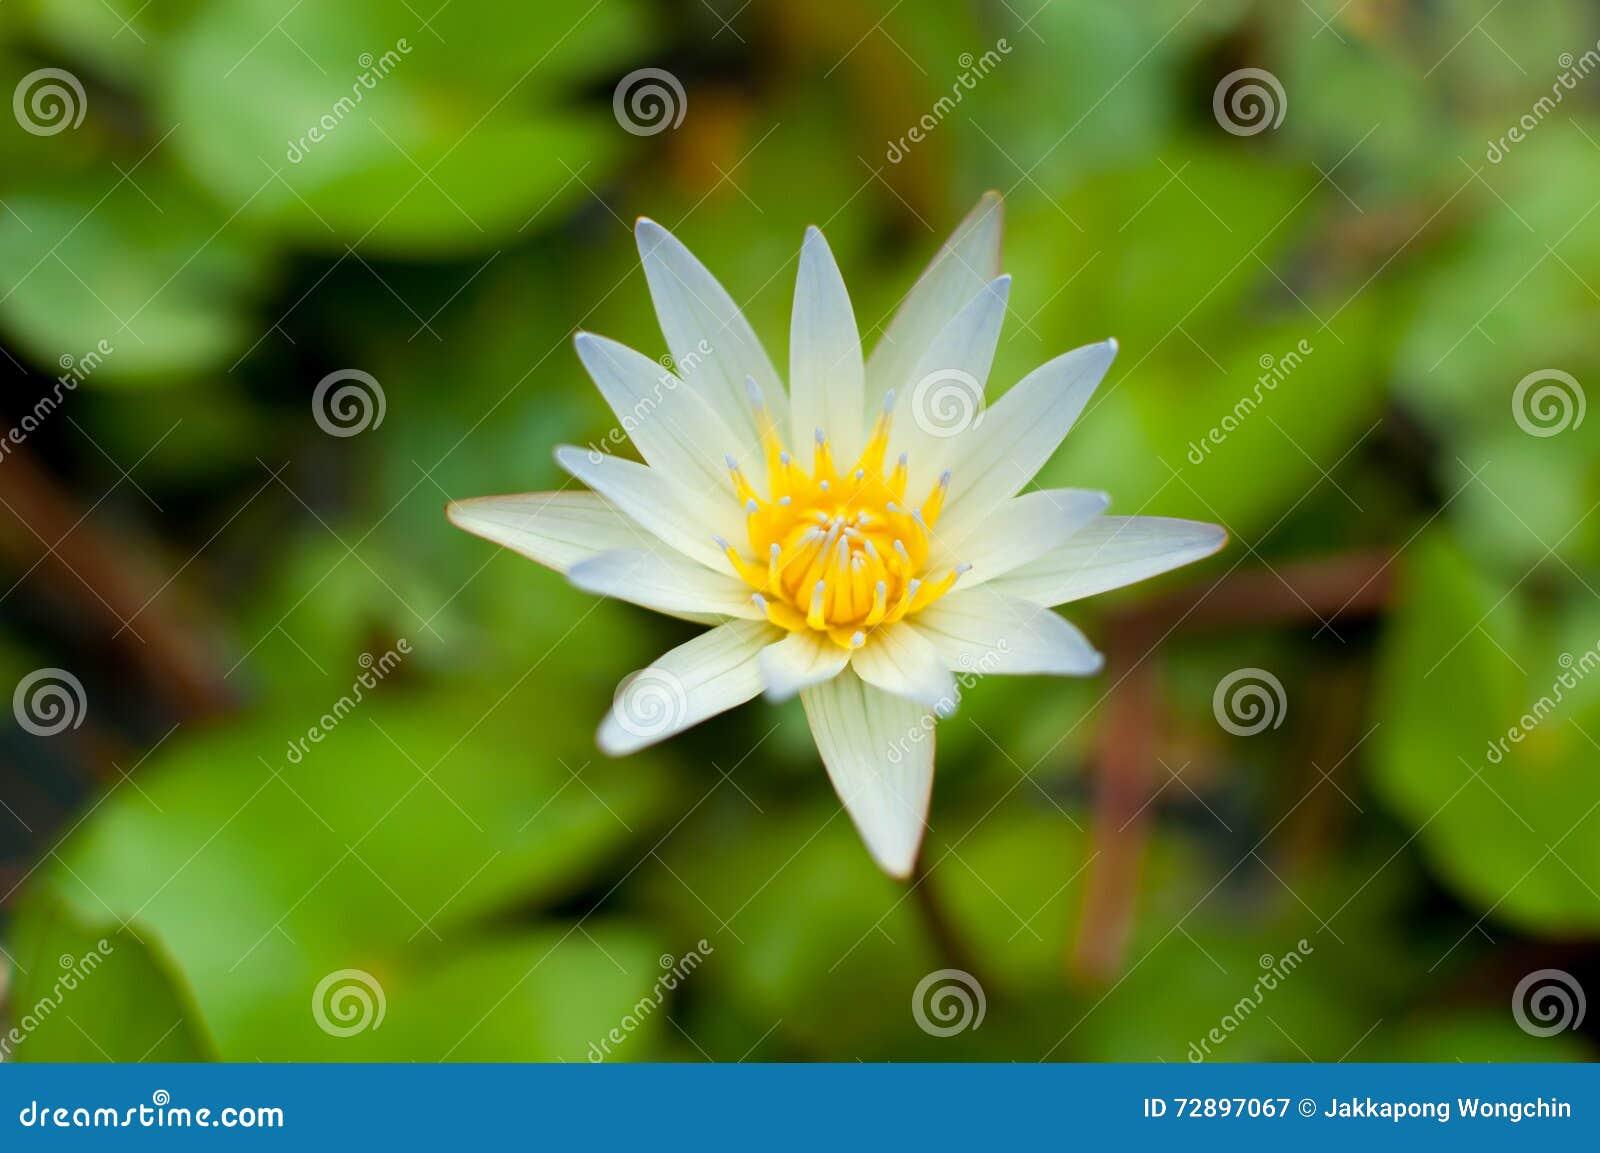 White Lotus Flower Stock Image Image Of Nature Fairytale 72897067